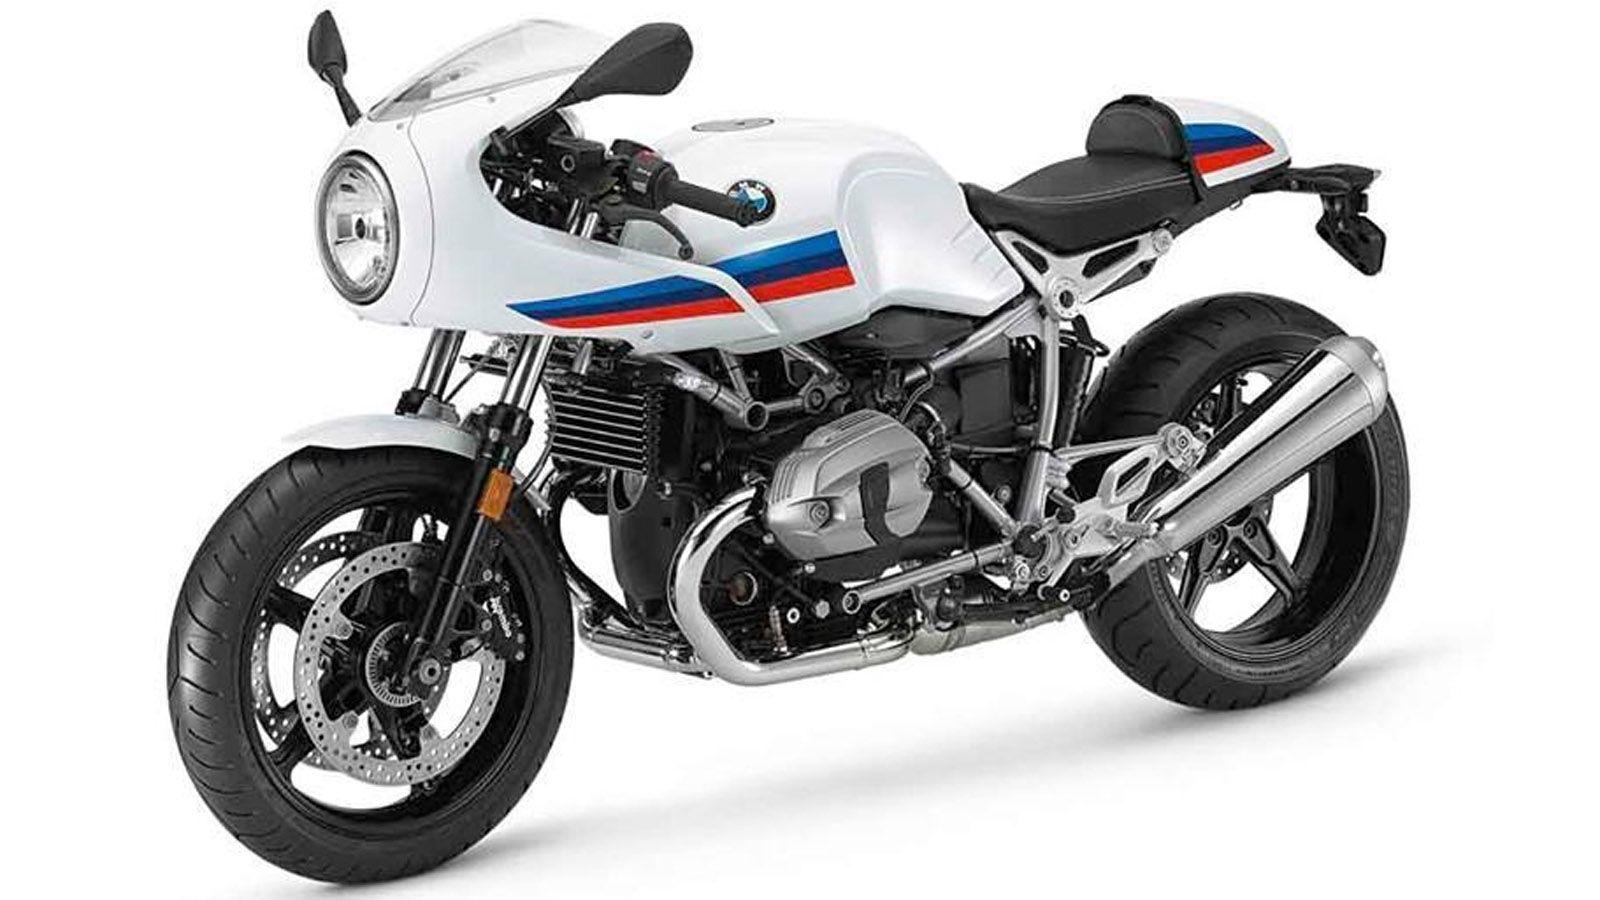 To BMW R NineT Racer H PRWTH EPISHMH FWTOGRAFIA_111355on Yamaha Xt 125